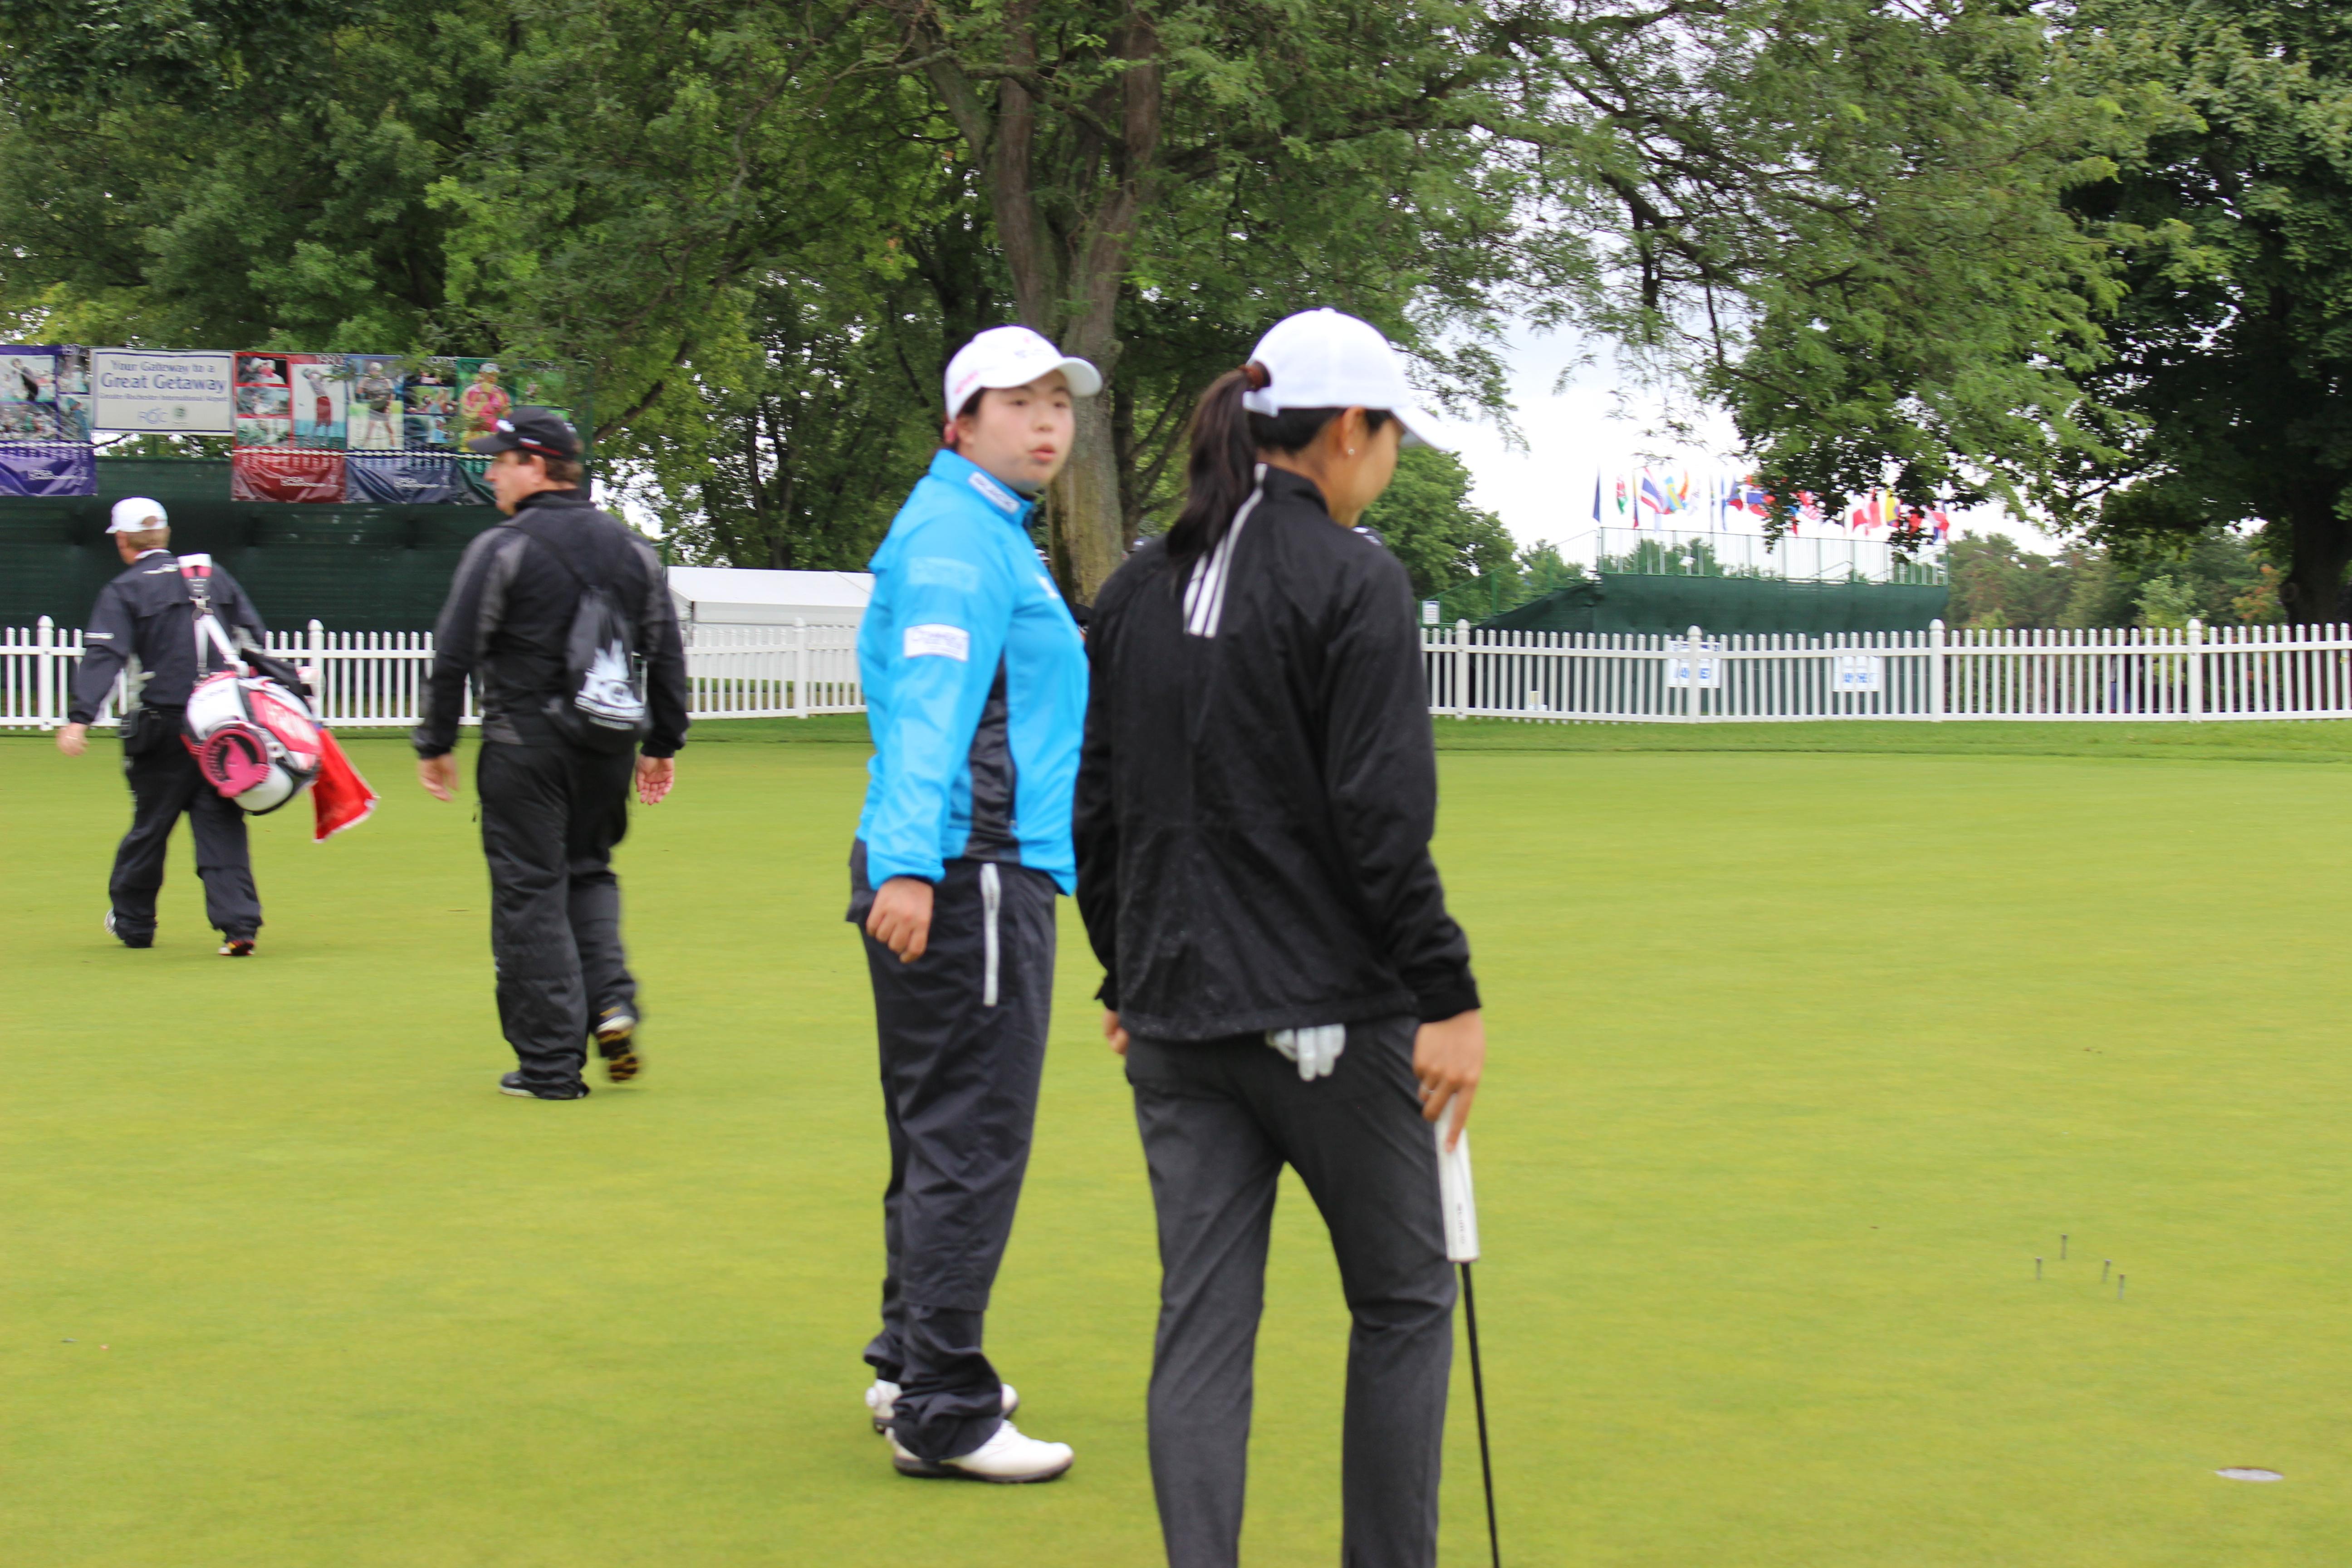 Life-Styles-with-Pretty- Price-Wegmans-LPGA- Championship-Practice-Round-6